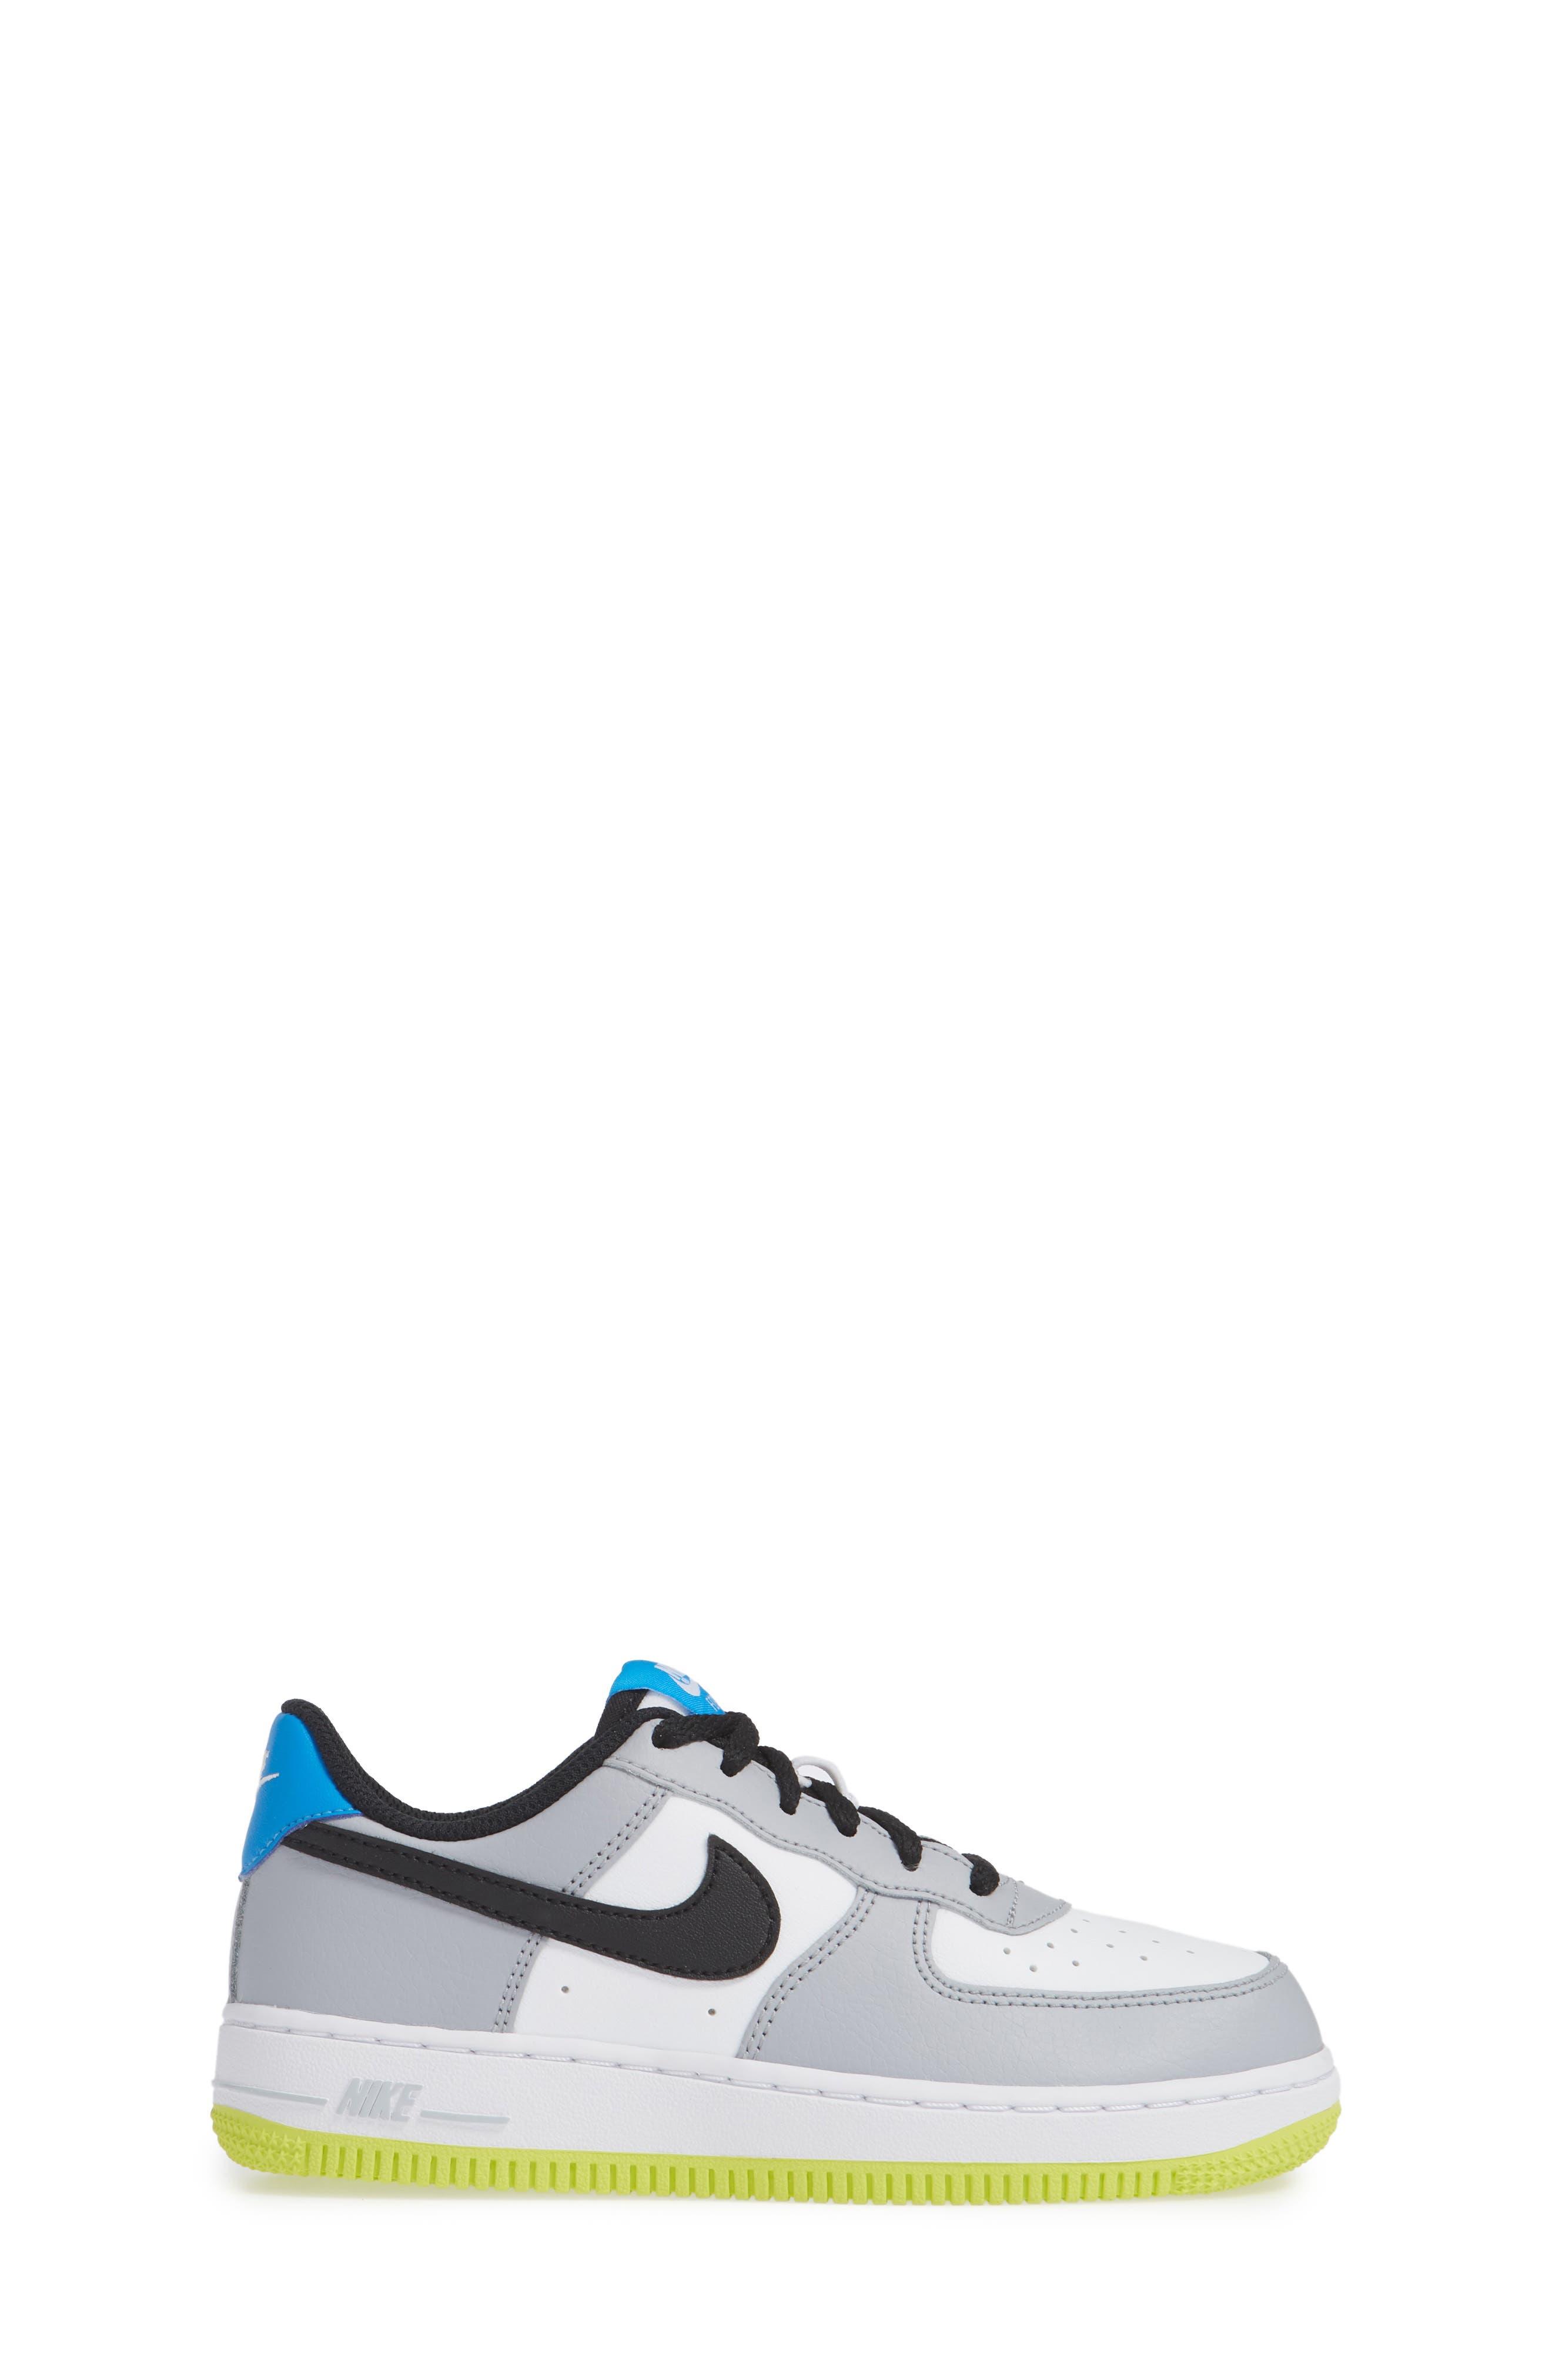 Air Force 1 Sneaker,                             Alternate thumbnail 6, color,                             Wolf Grey/ Black/ White/ Blue